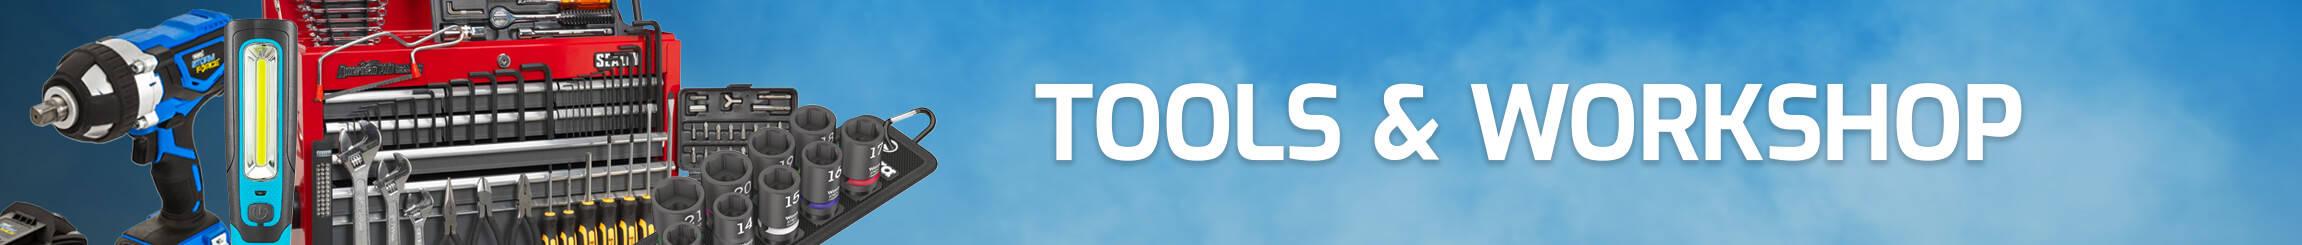 Tools & Workshop Payday Deals